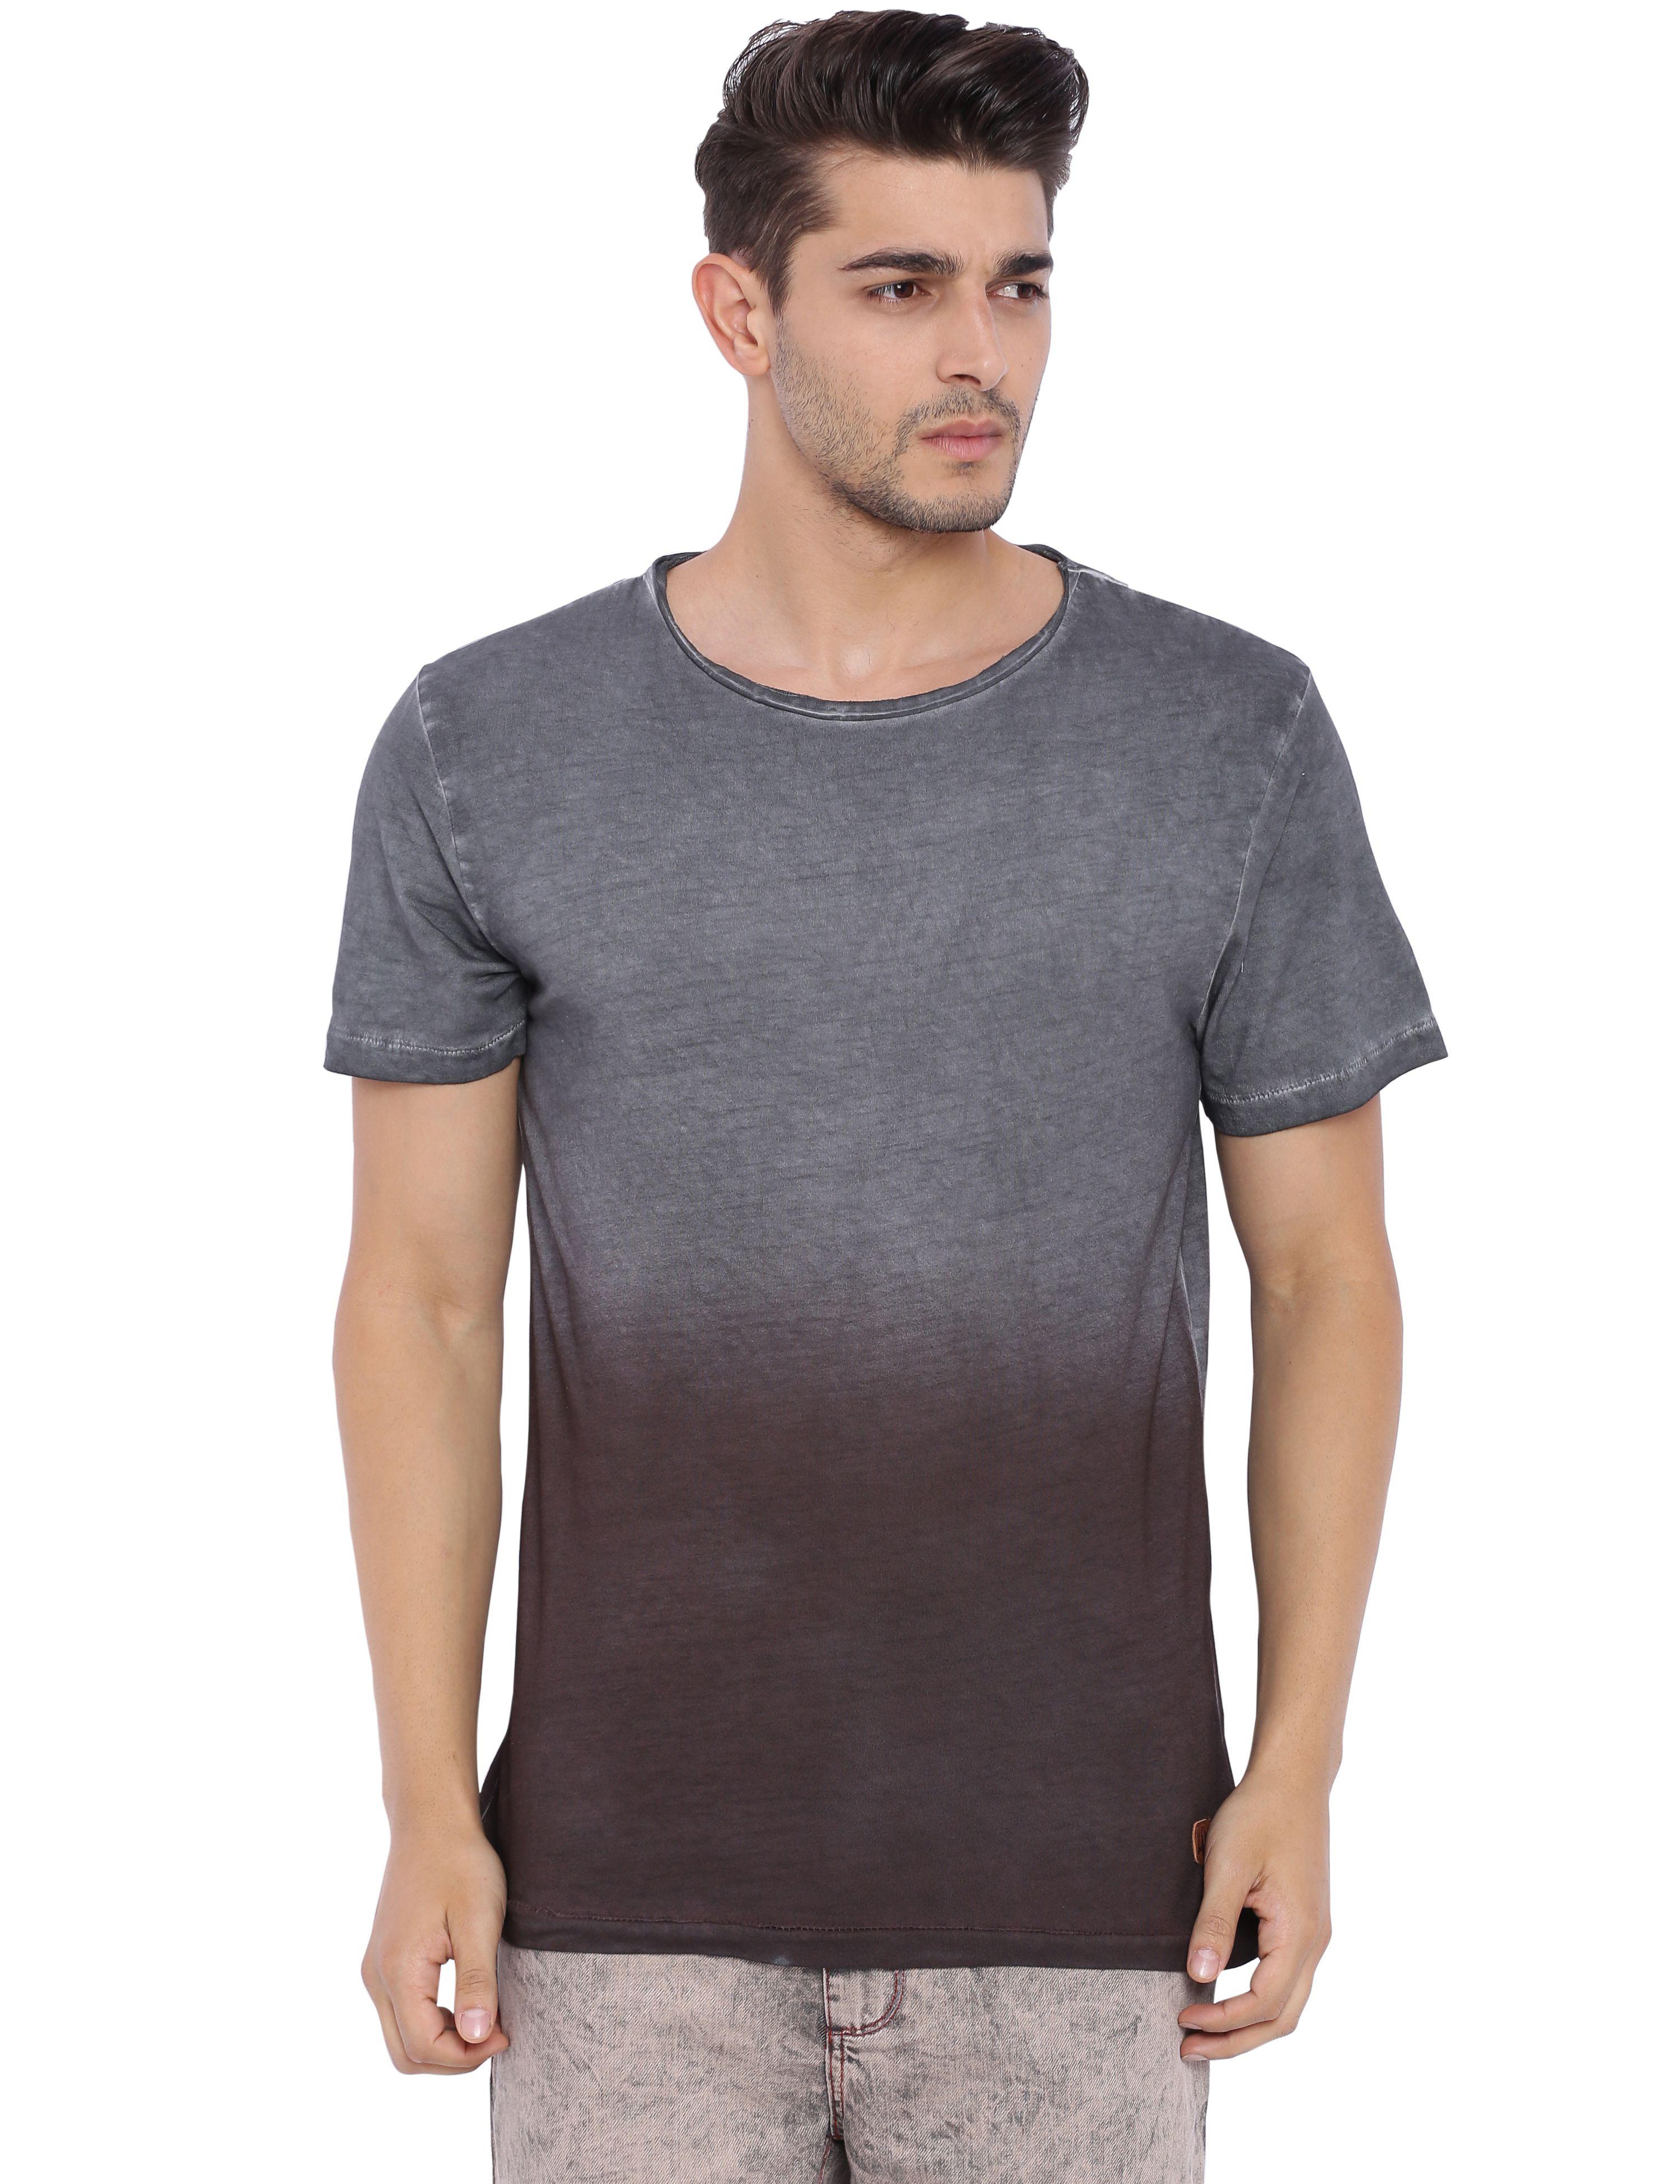 Blue Saint Multi Round T-Shirt